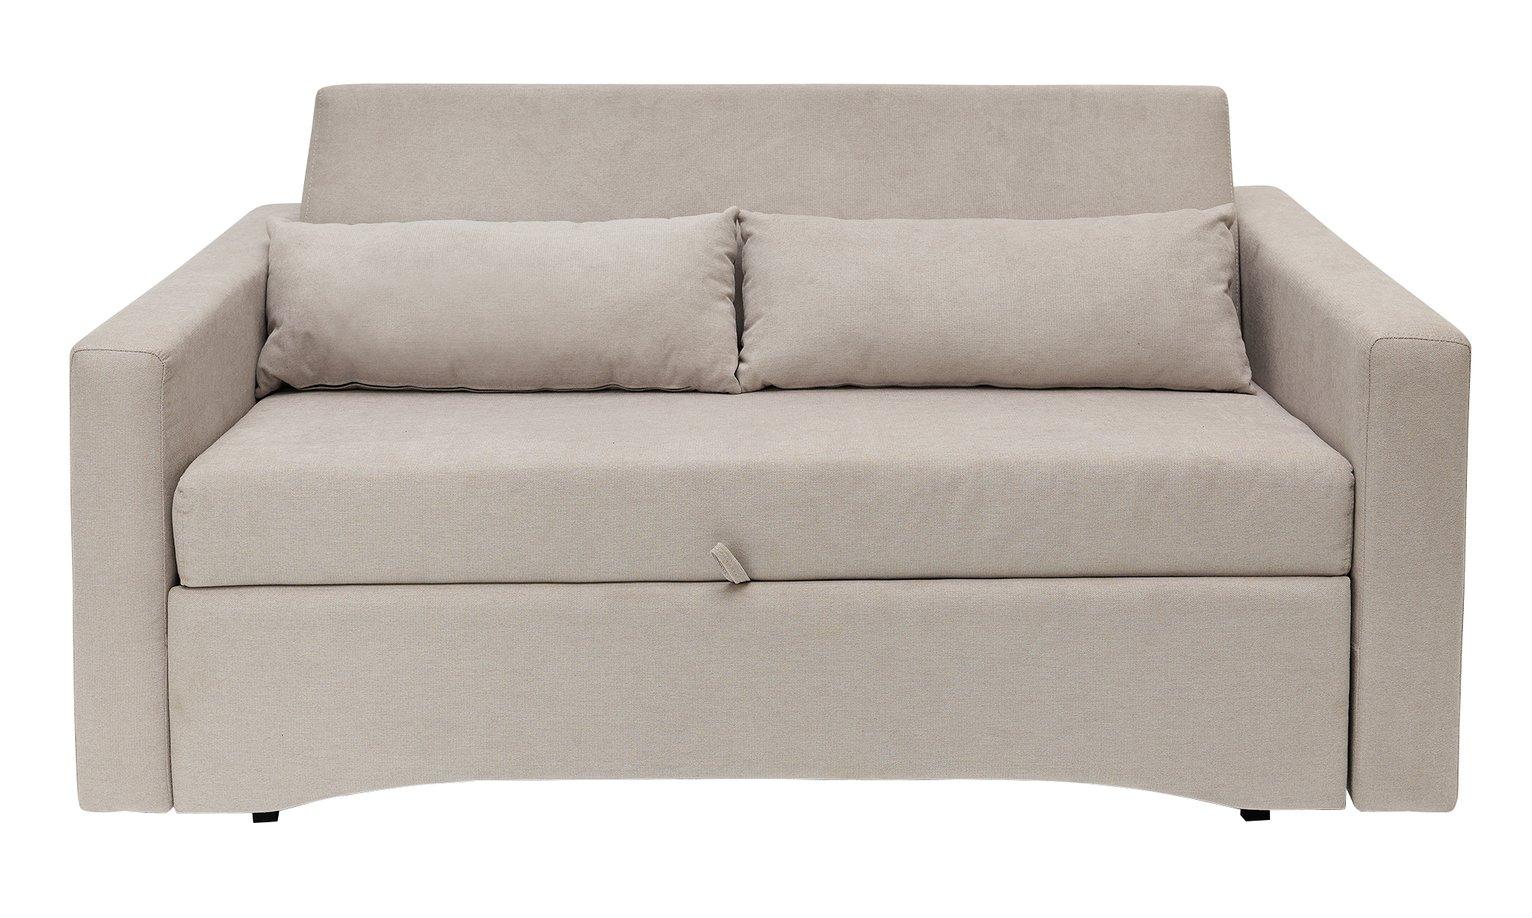 Argos Home Reagan 2 Seater Fabric Sofa Bed - Natural